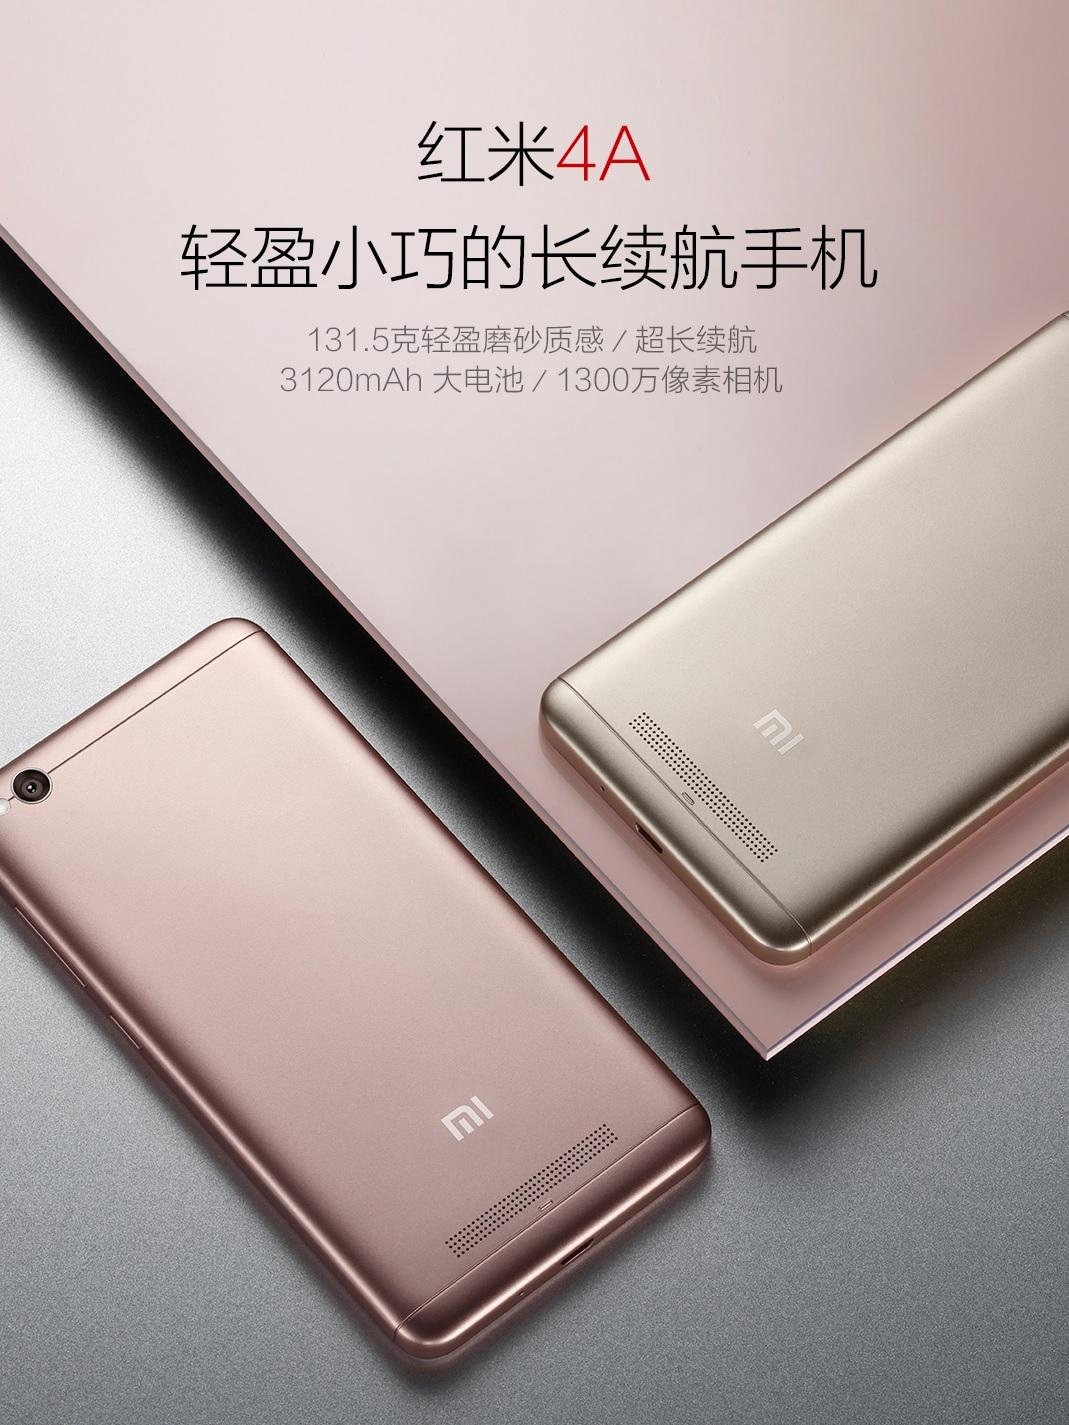 Xiaomi Redmi4A ประกันศูนย์ไทย แรม 2 / 32 GB แถมเคส ฟิม